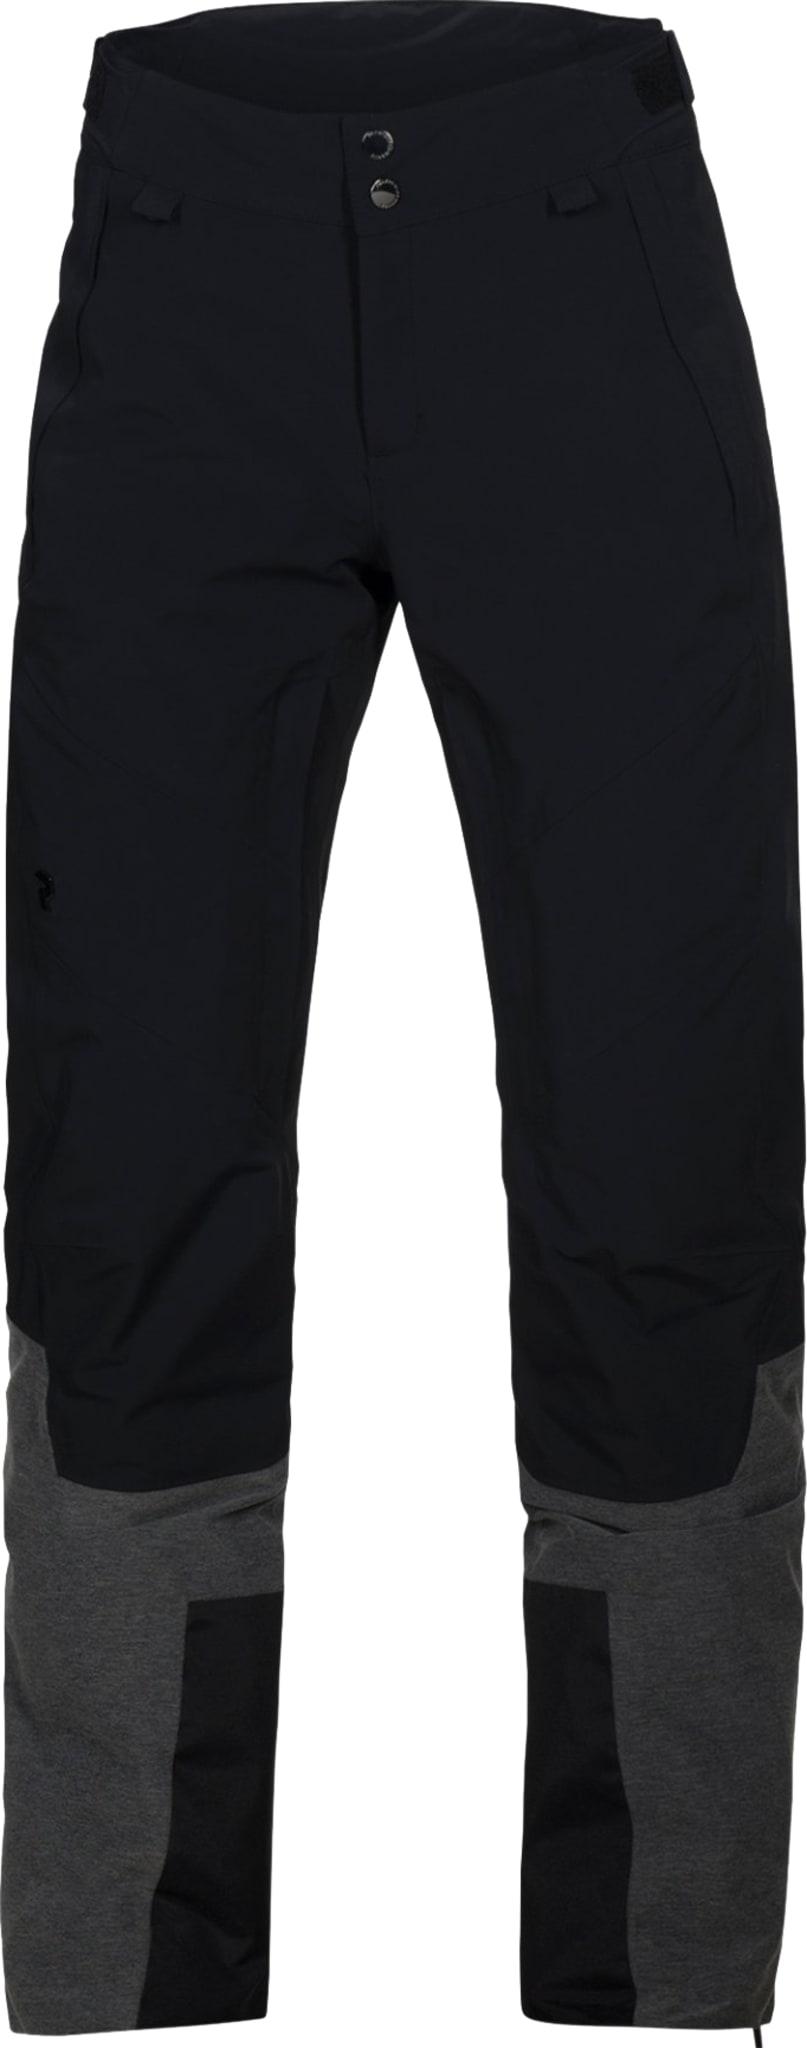 Velaero 2l Padded Pants W